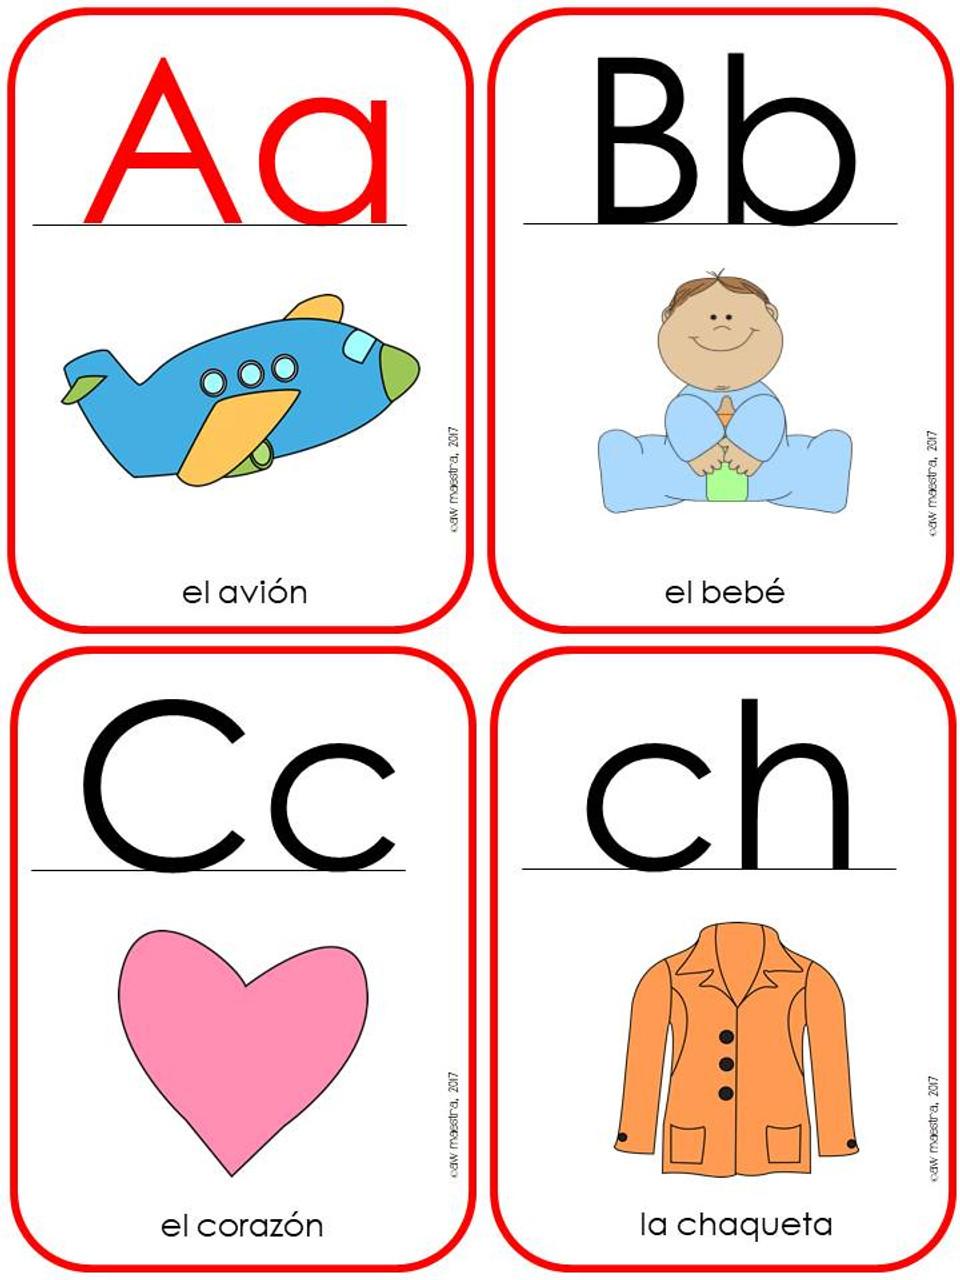 Spanish Alphabet Posters, ABC Flash Cards, Initial Sounds Chart - El alfabeto y sonidos iniciales